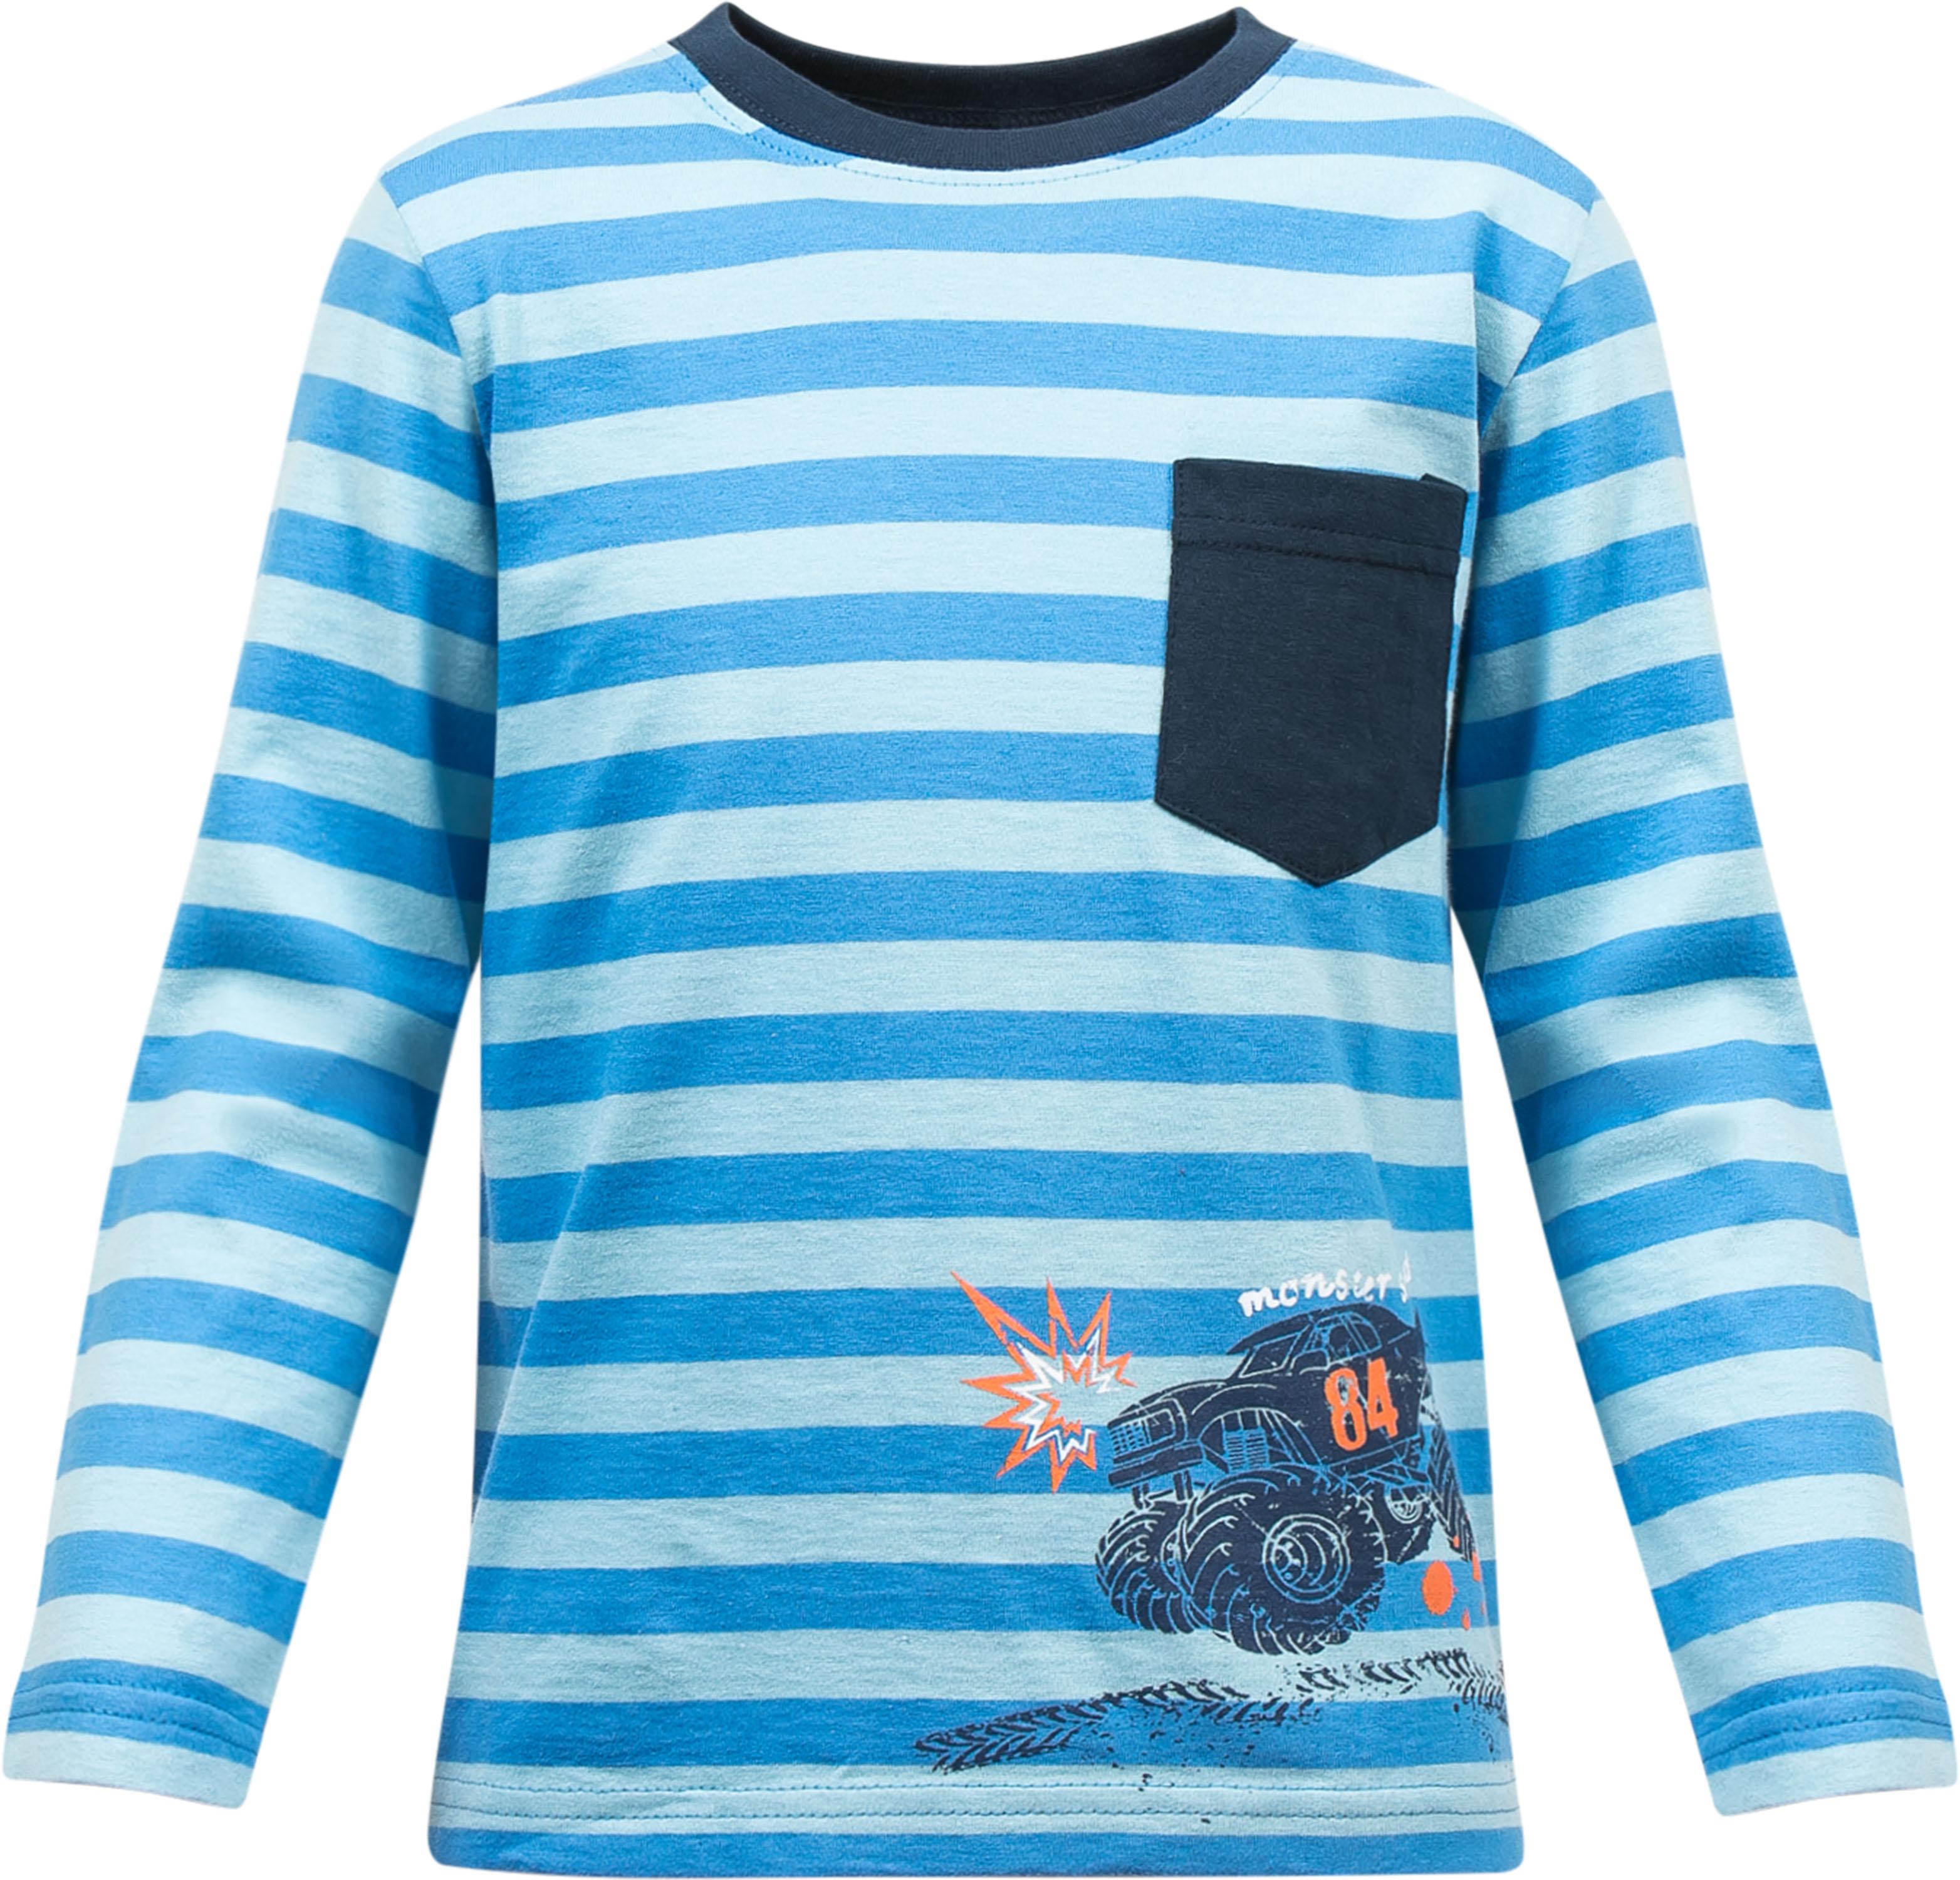 Футболки Barkito 850601 X75 футболки barkito футболка с длинным рукавом для мальчика barkito монстр трак синяя